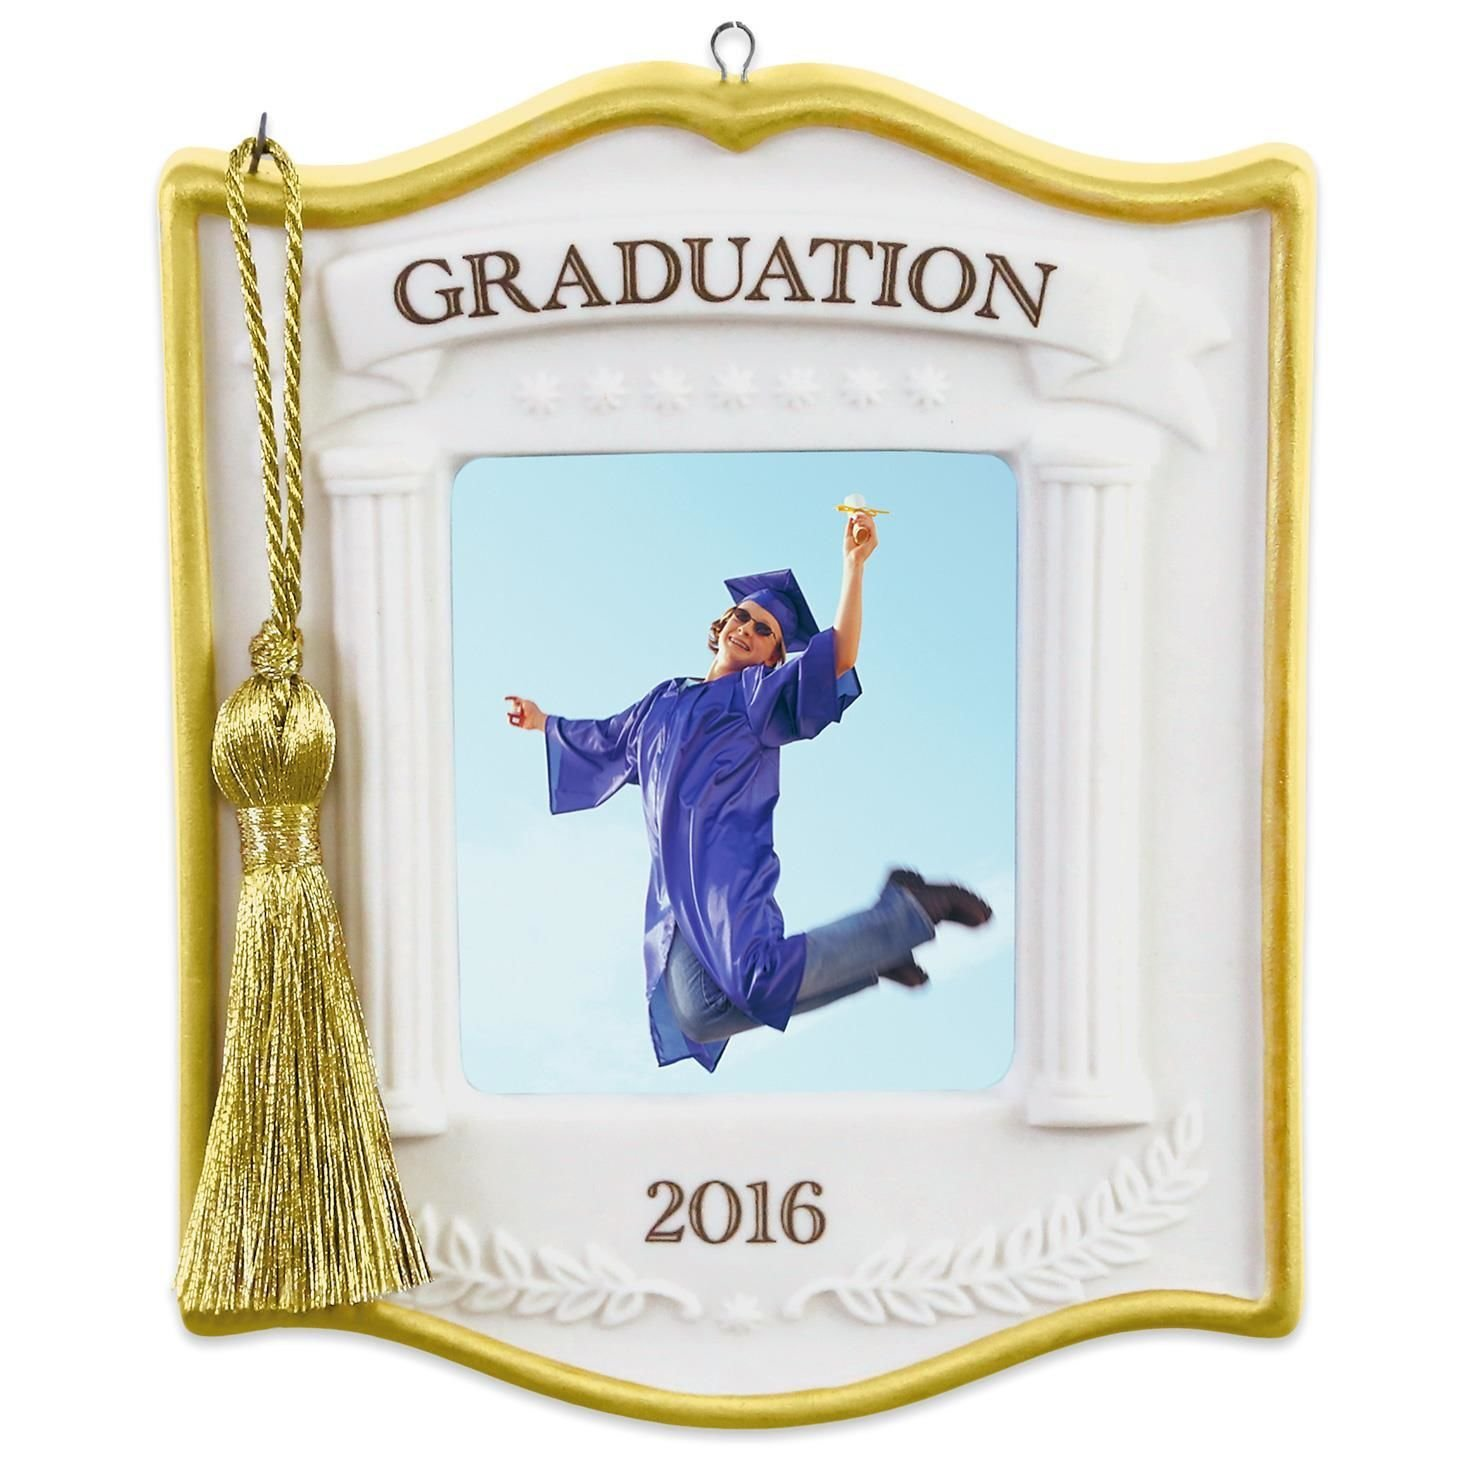 Hallmark Keepsake Graduate Day 2016